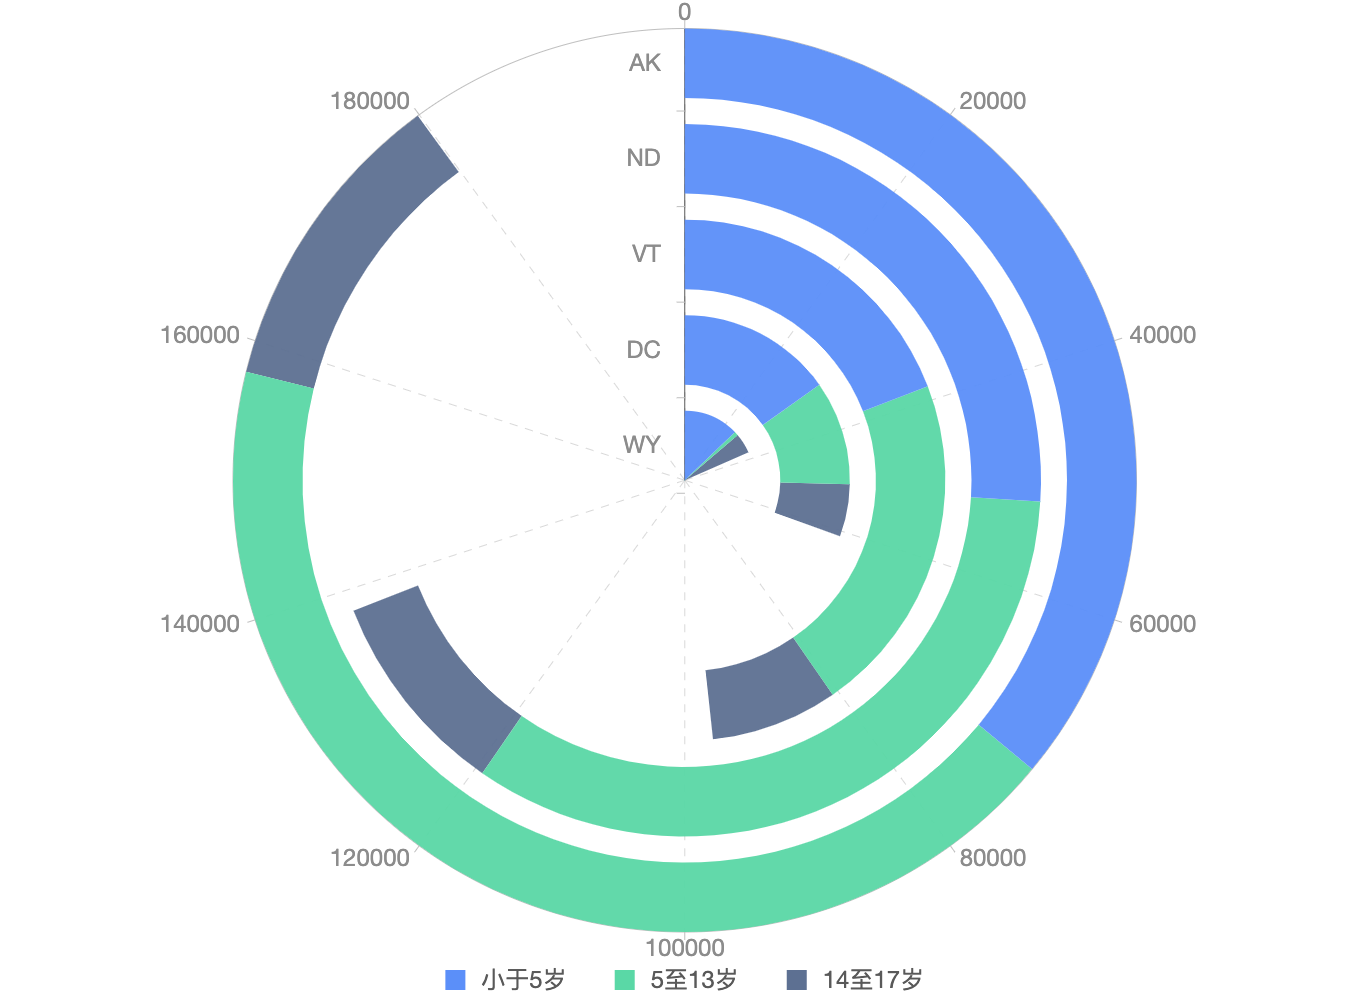 Radial stacked bar chart